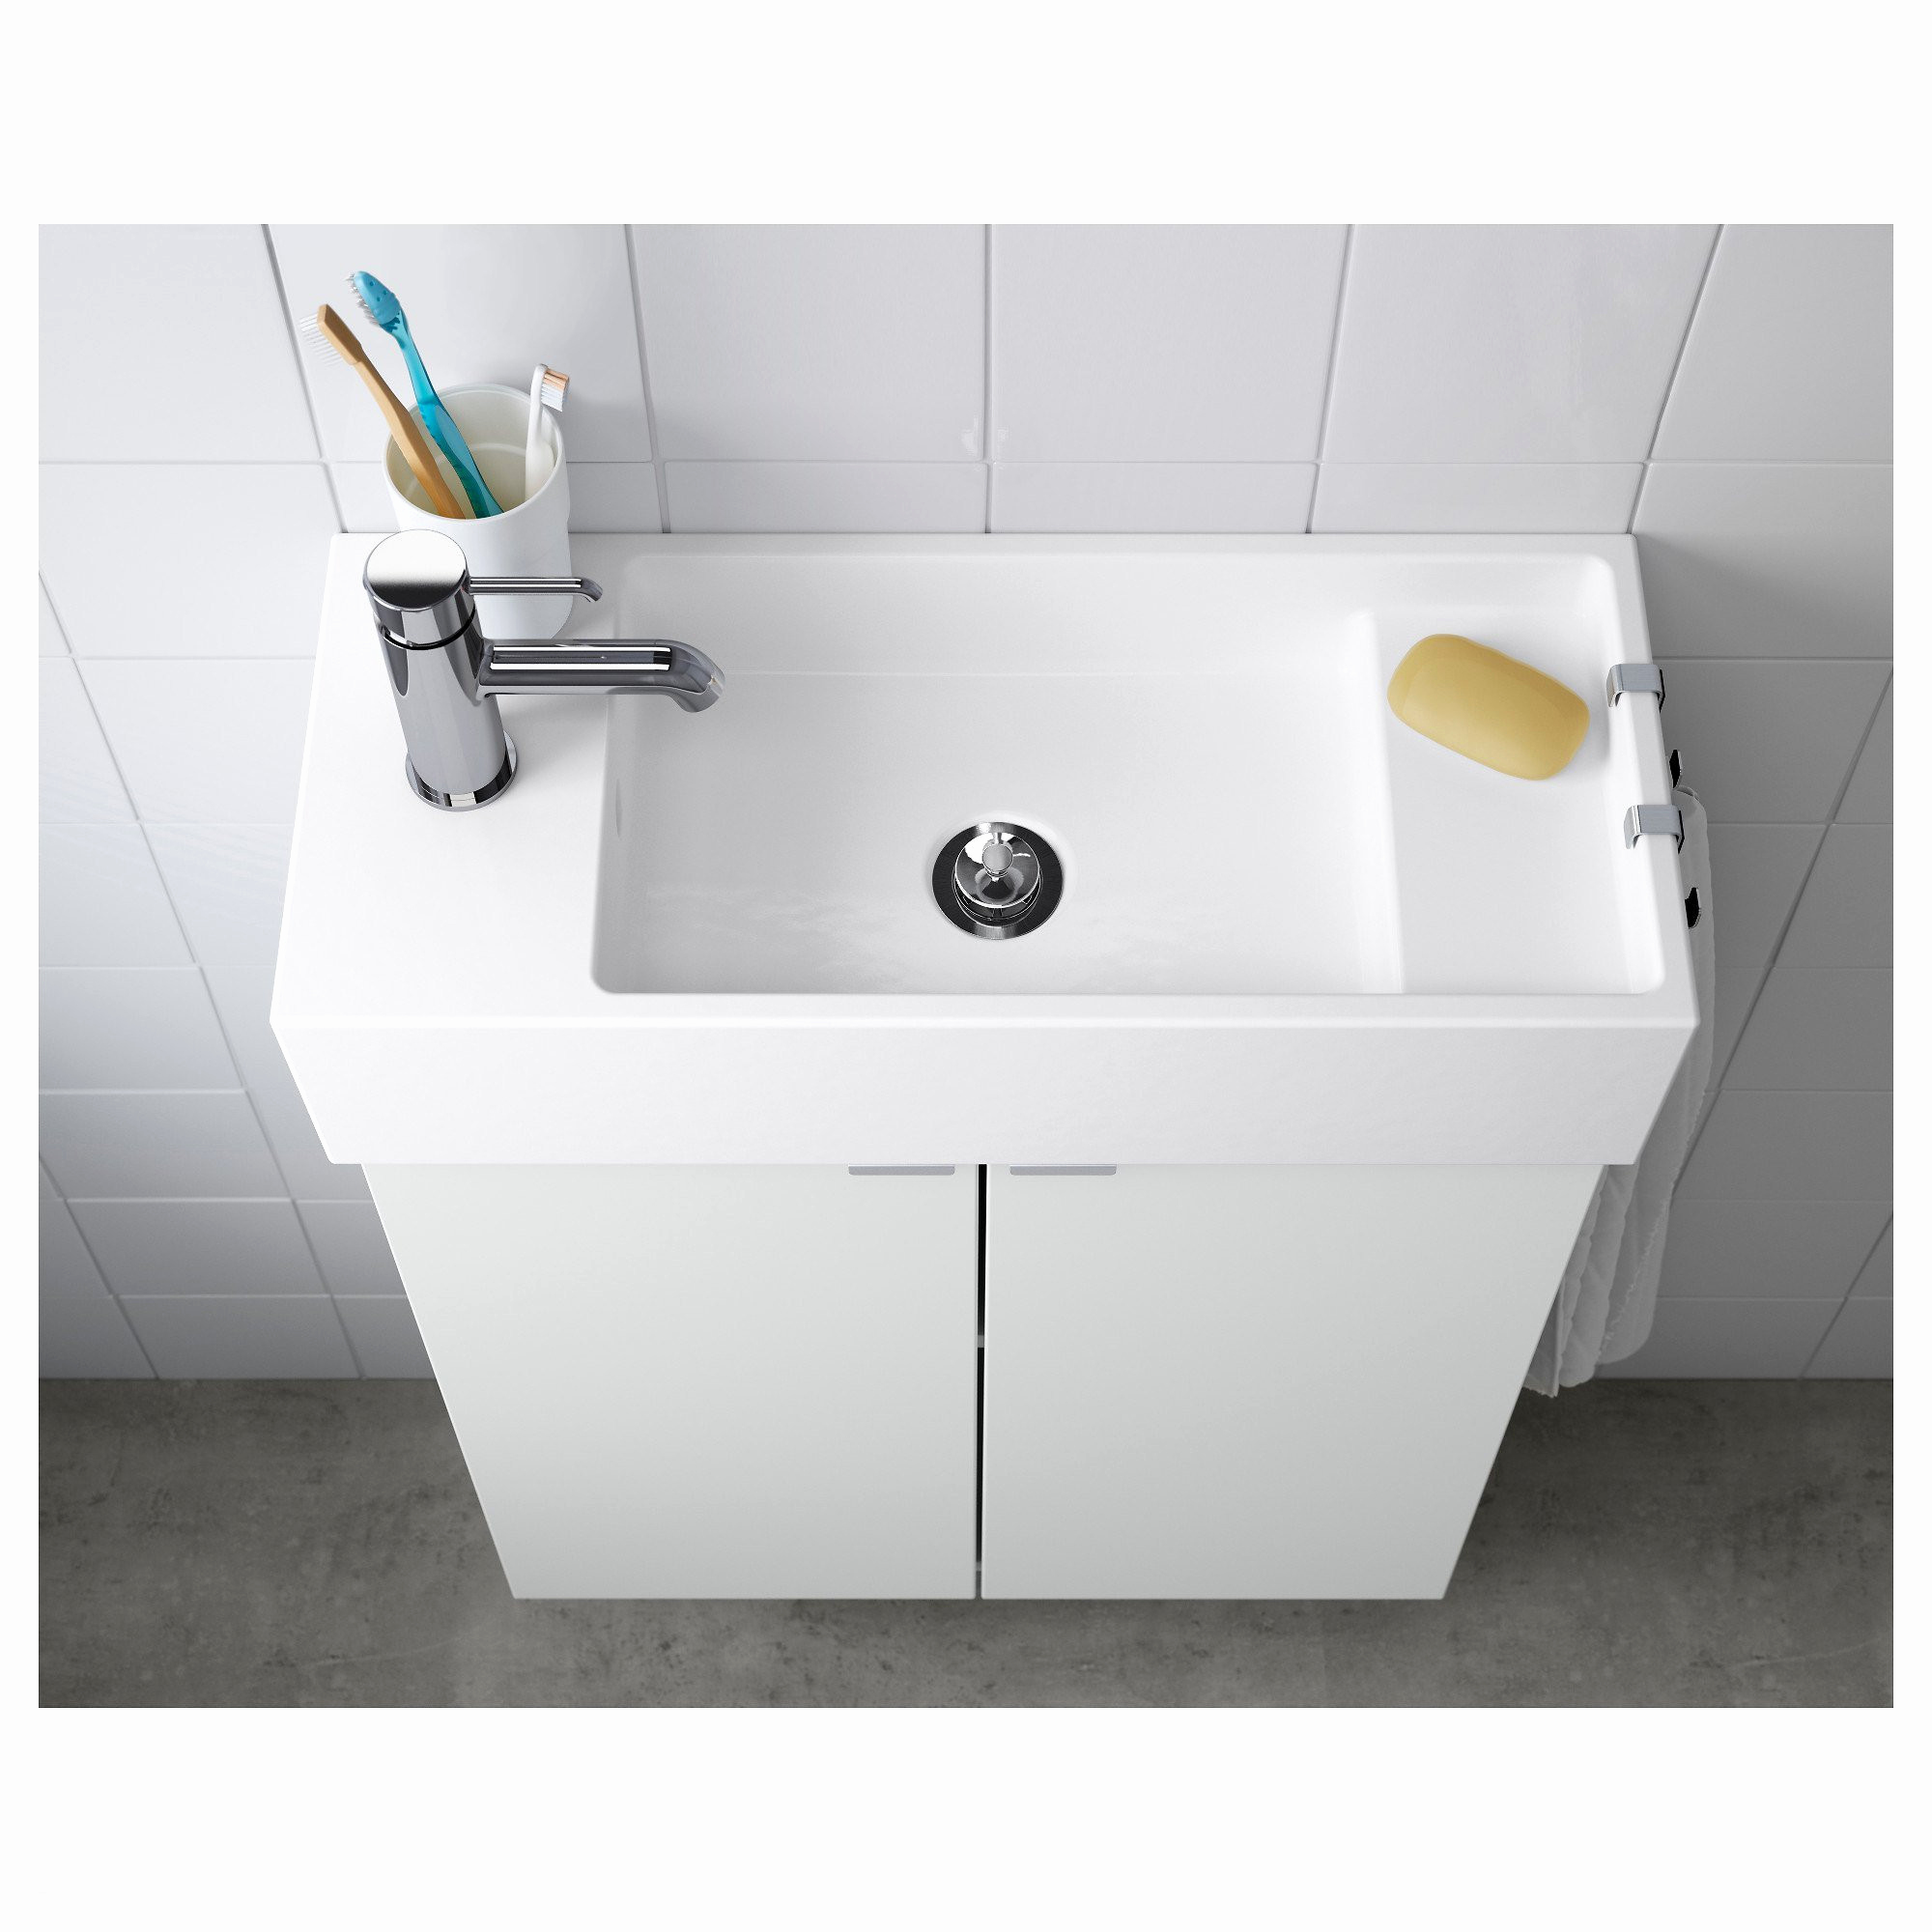 Salles De Bain Ikea Beau Photos Salle Gnial Bathroom Storage Cabinet Unique 26